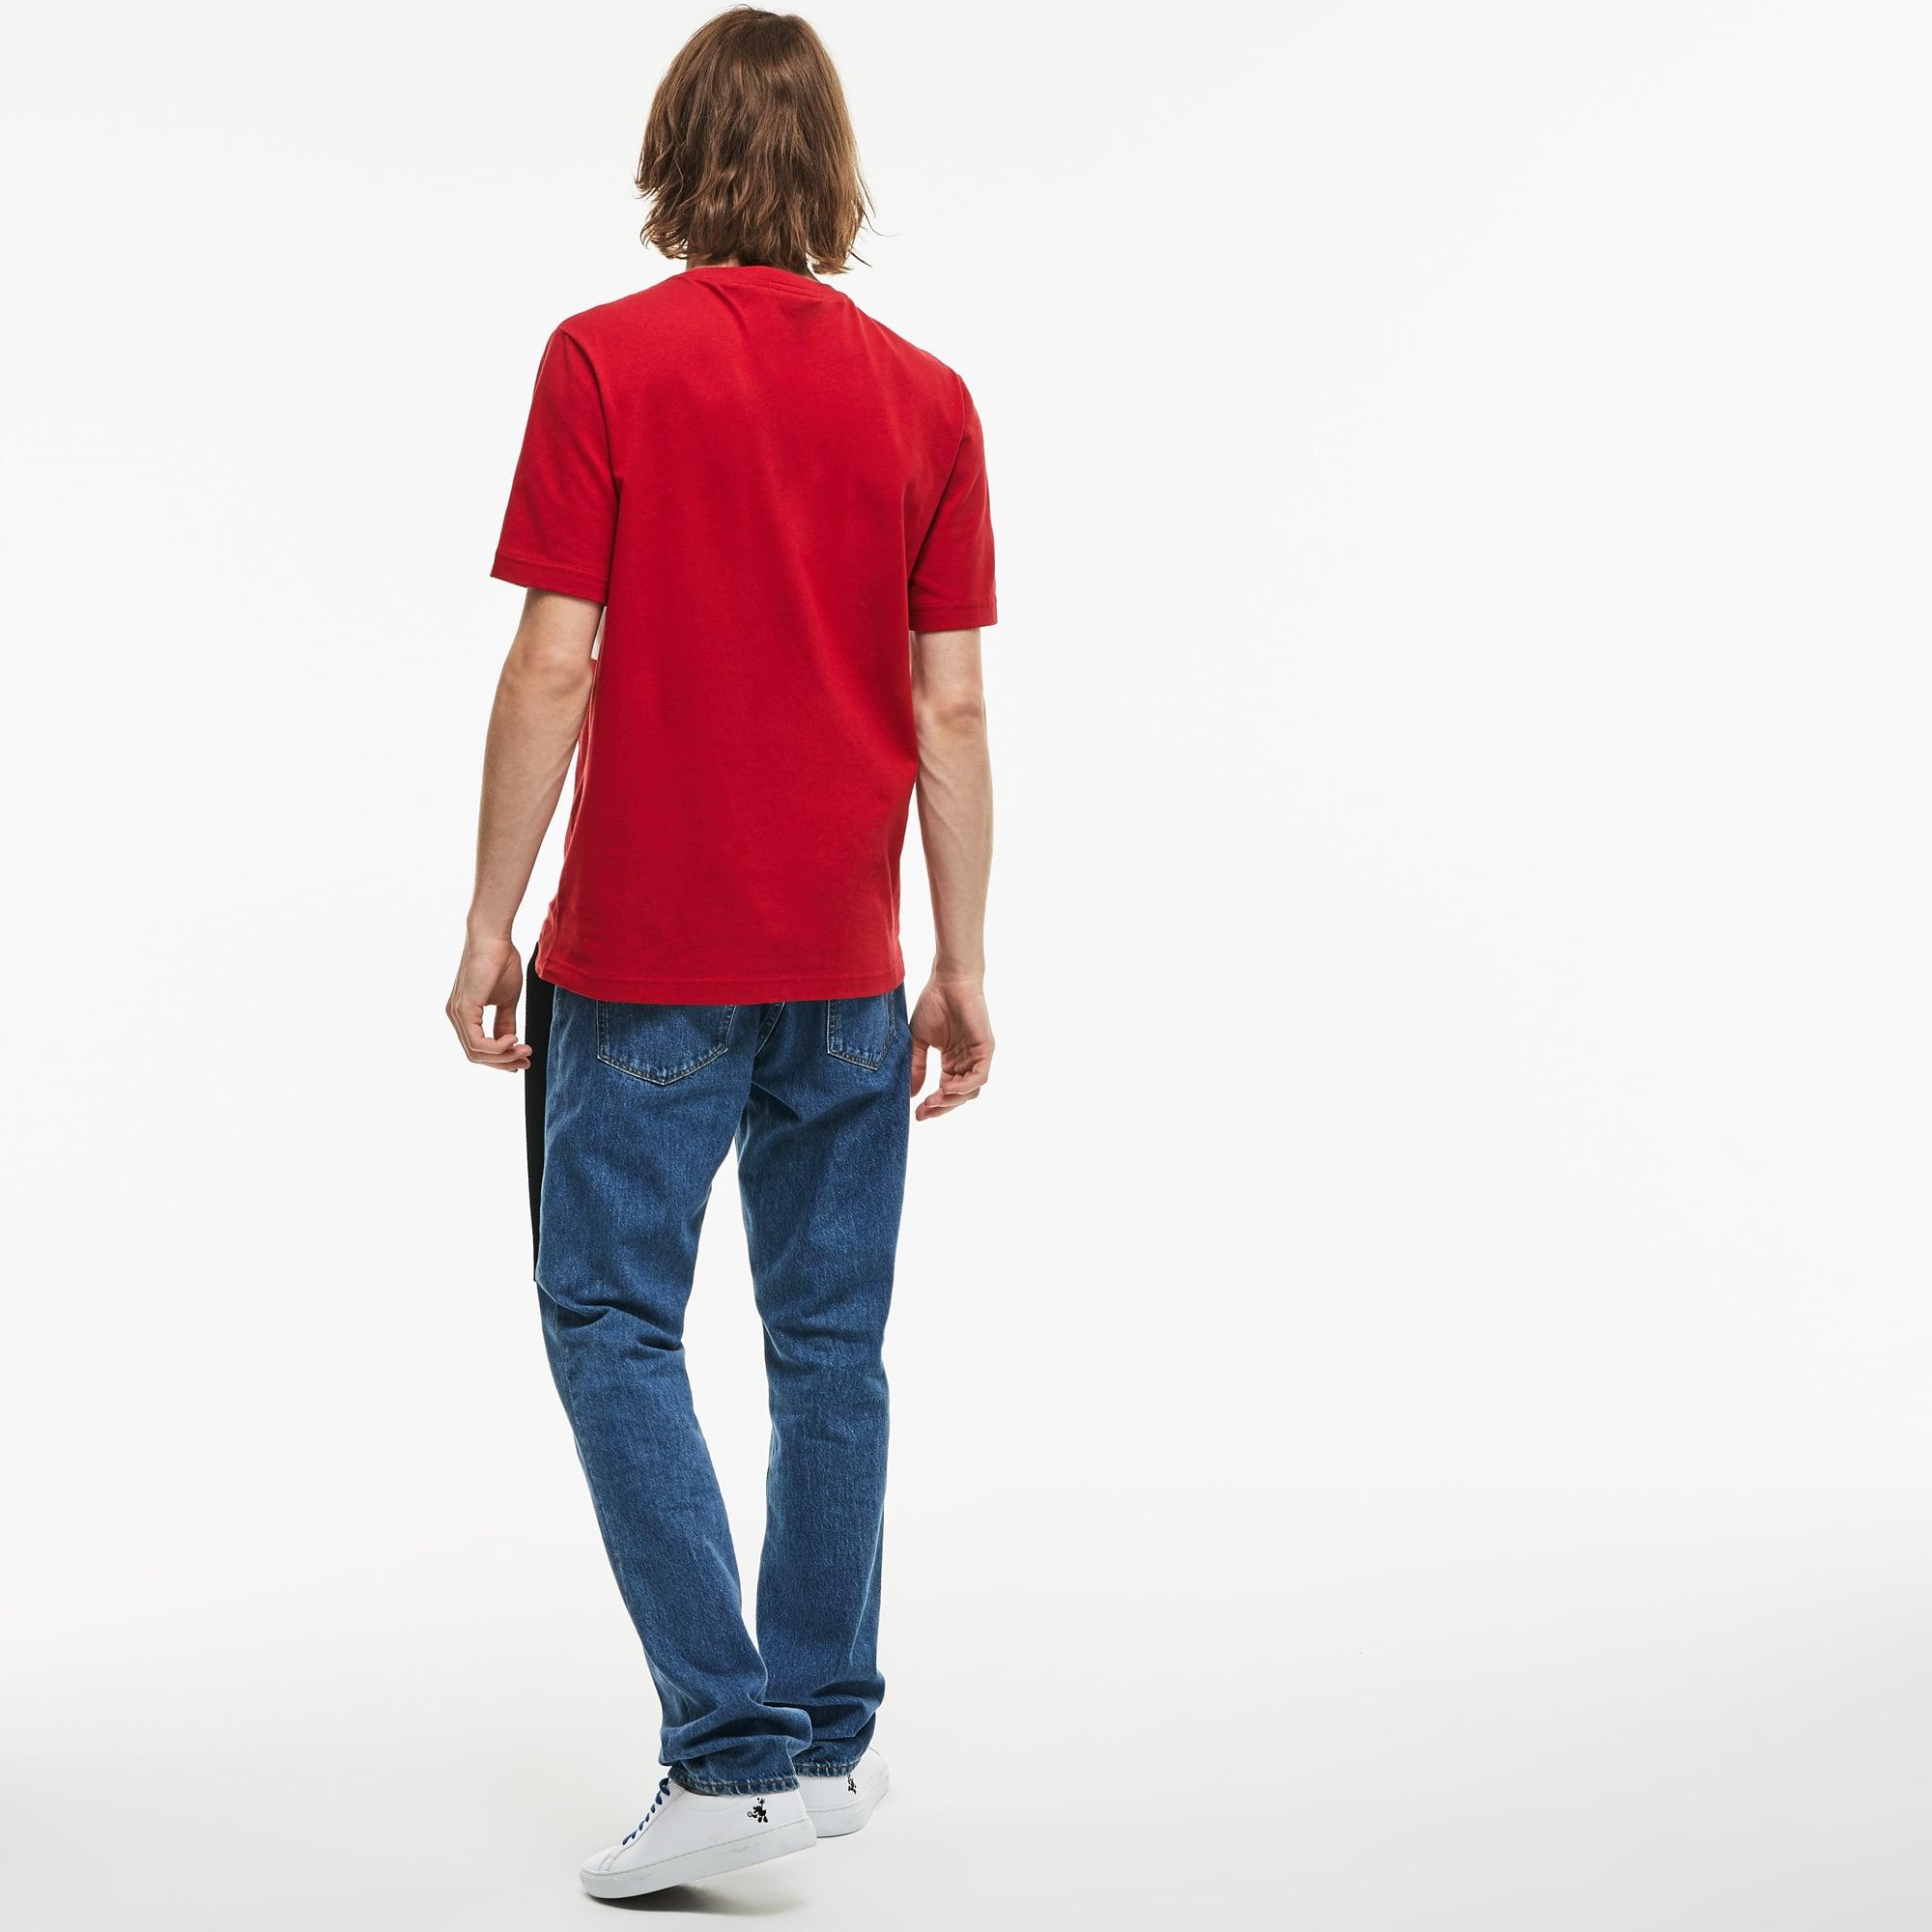 784ec0f9 Men's Disney Mickey Graphic Band Cotton Jersey T-shirt